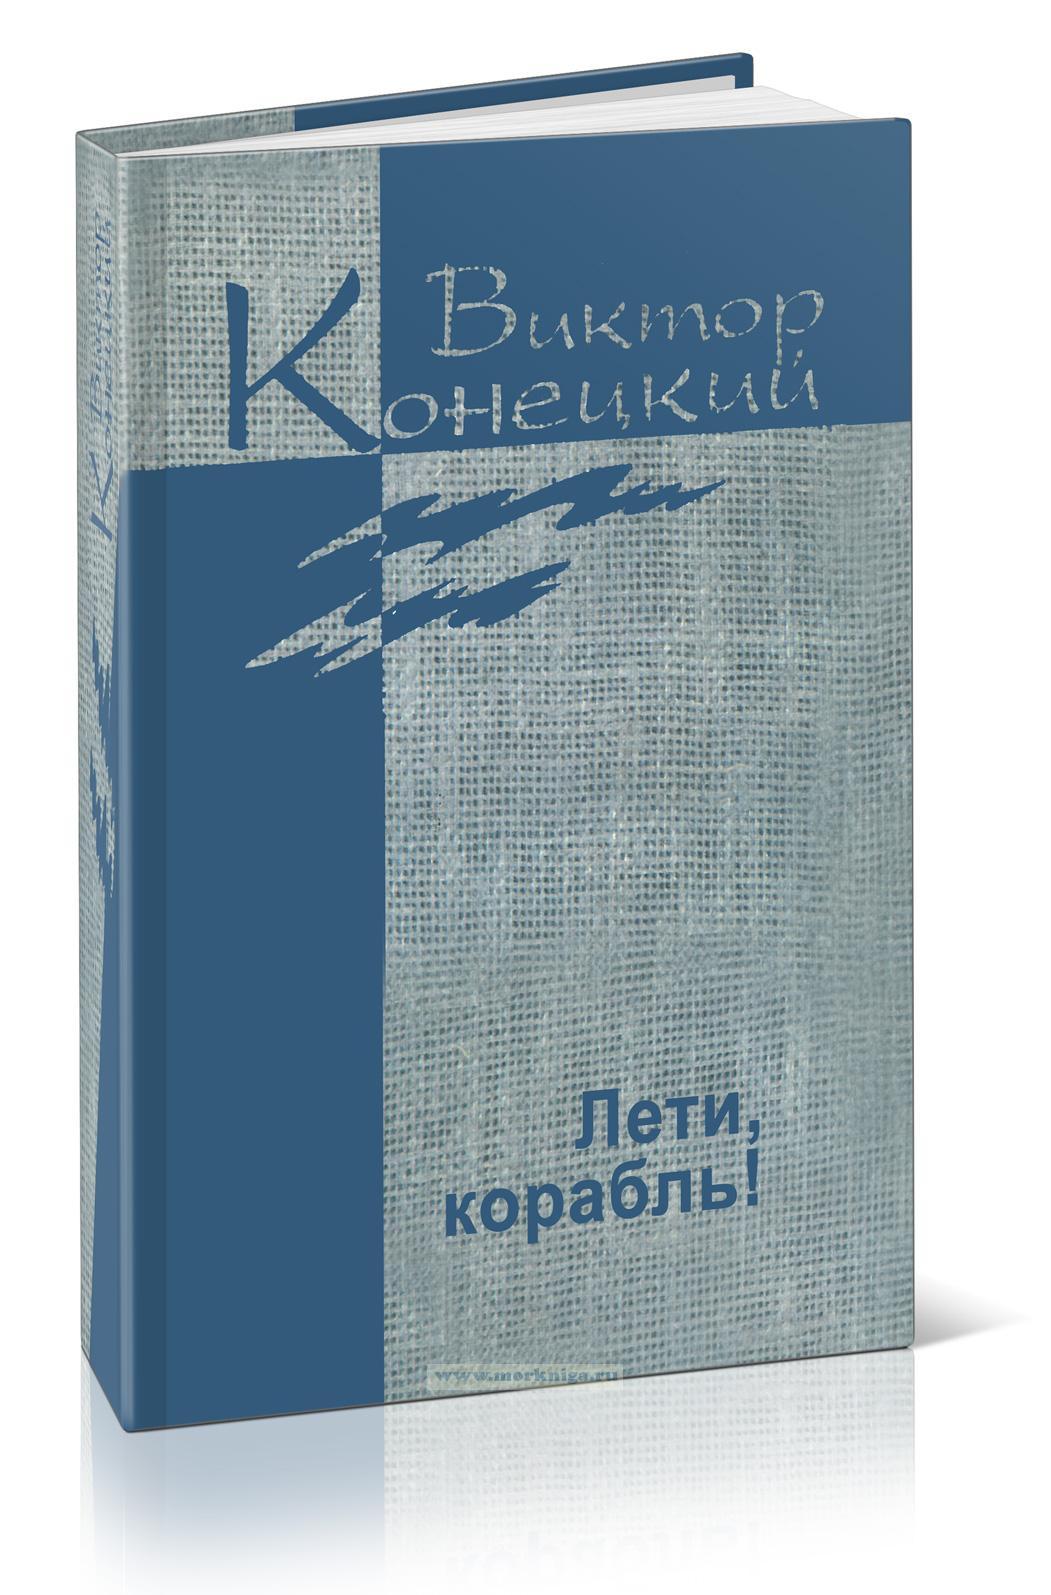 Собрание сочинений Виктора Конецкого в семи томах